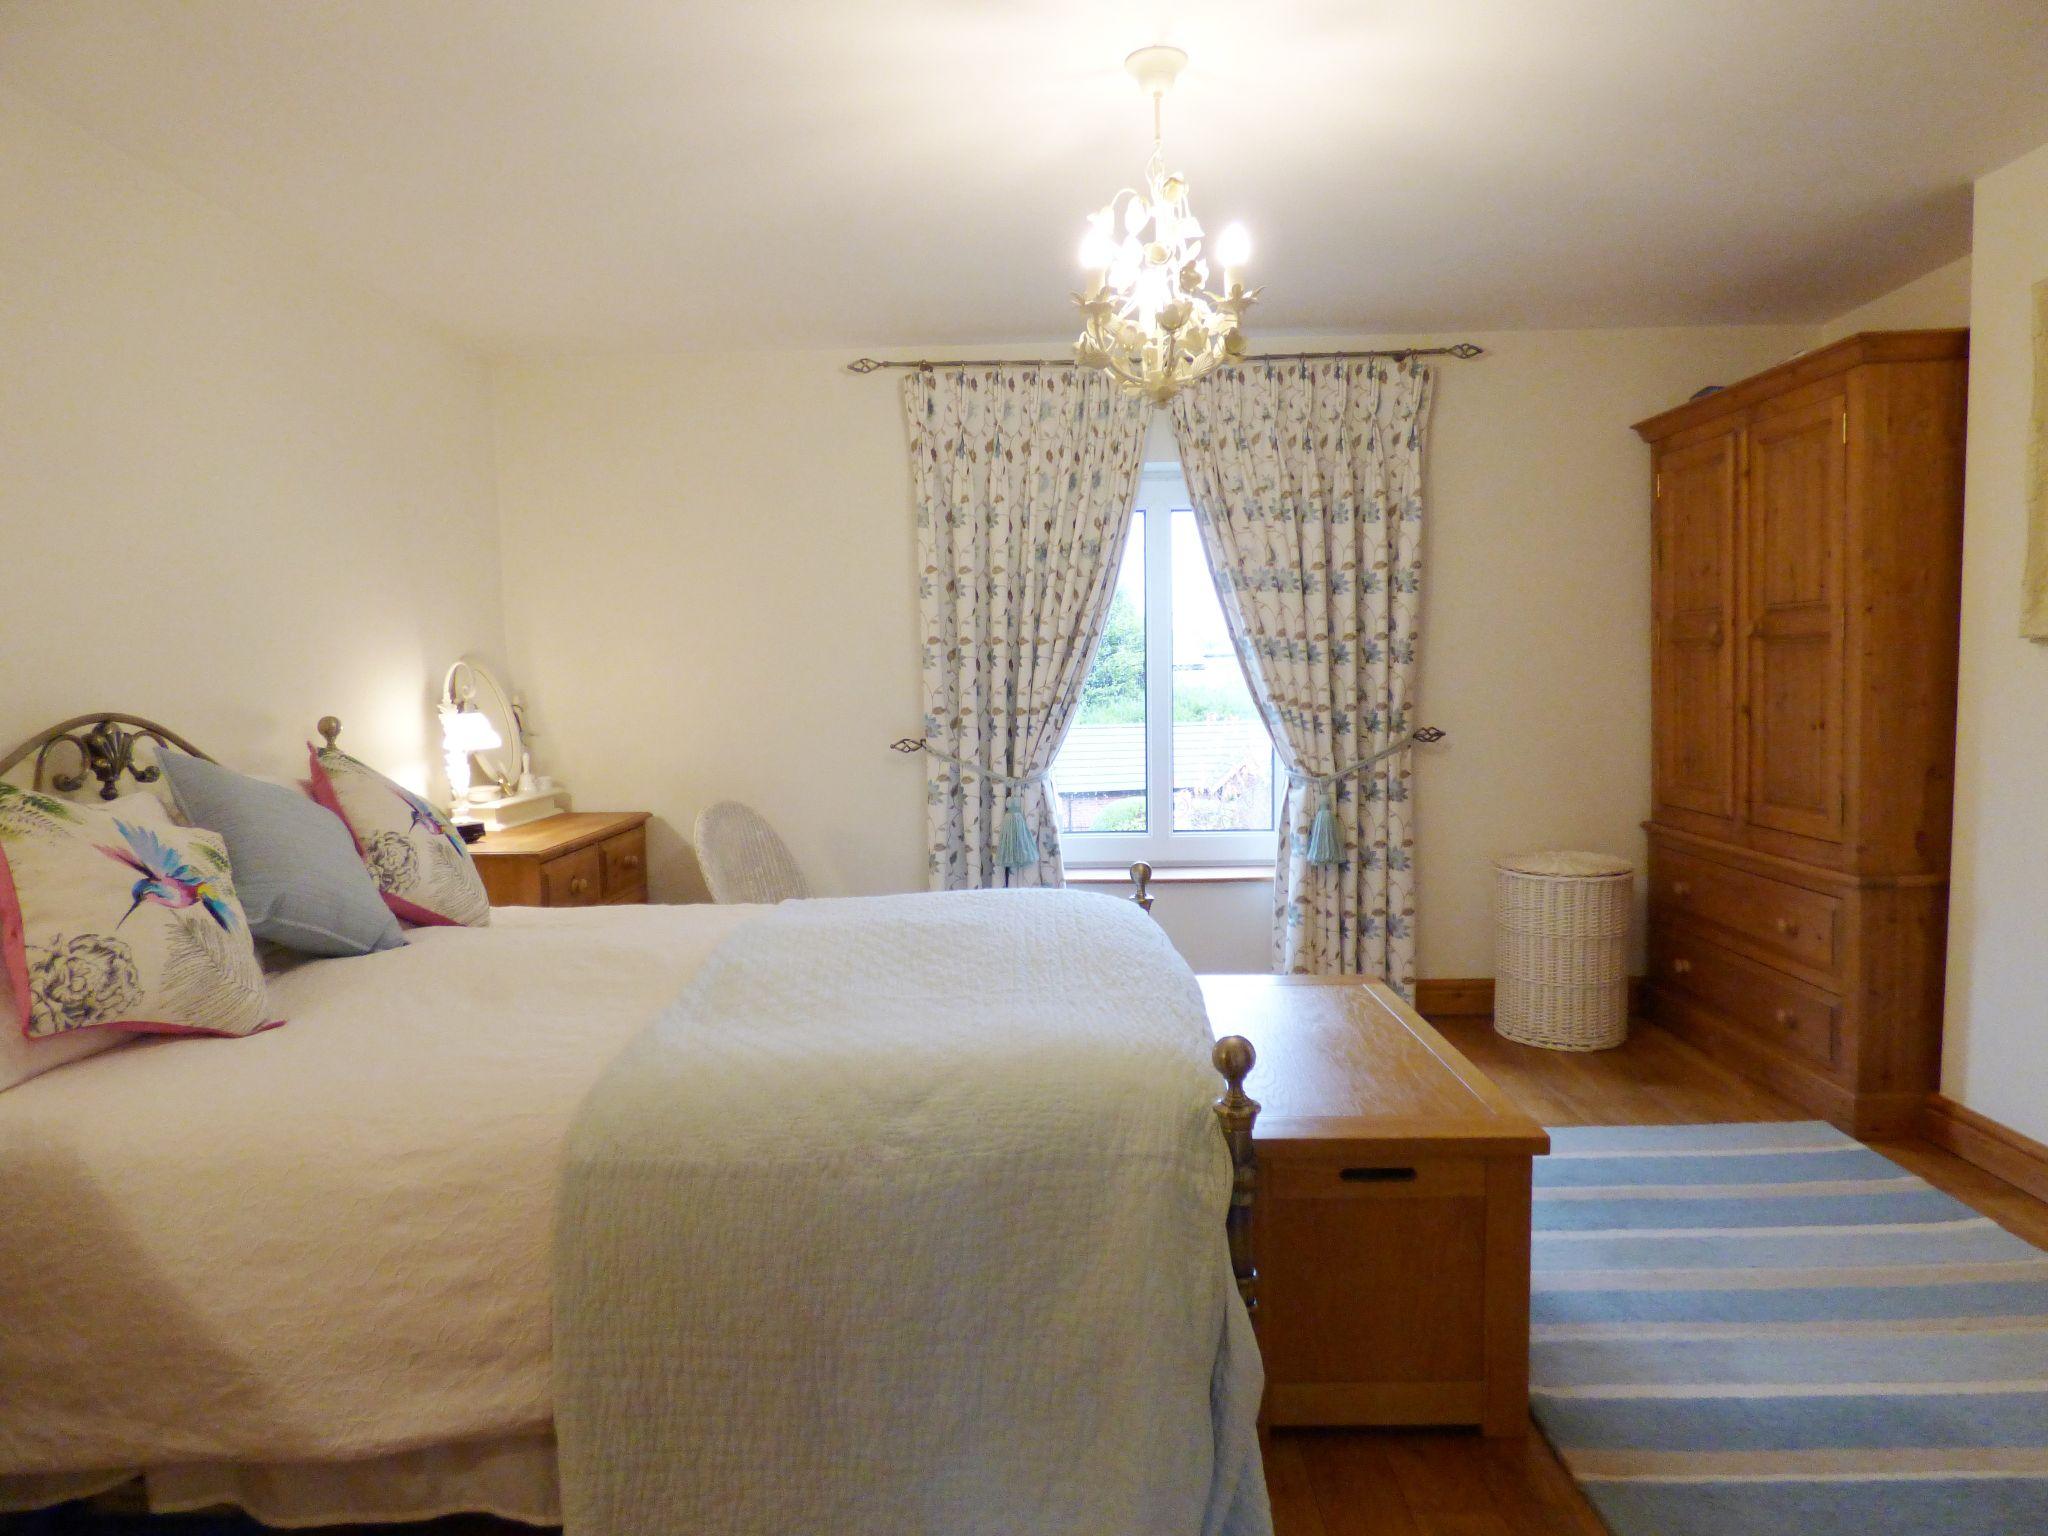 2 Bedroom Cottage House For Sale - Bedroom One